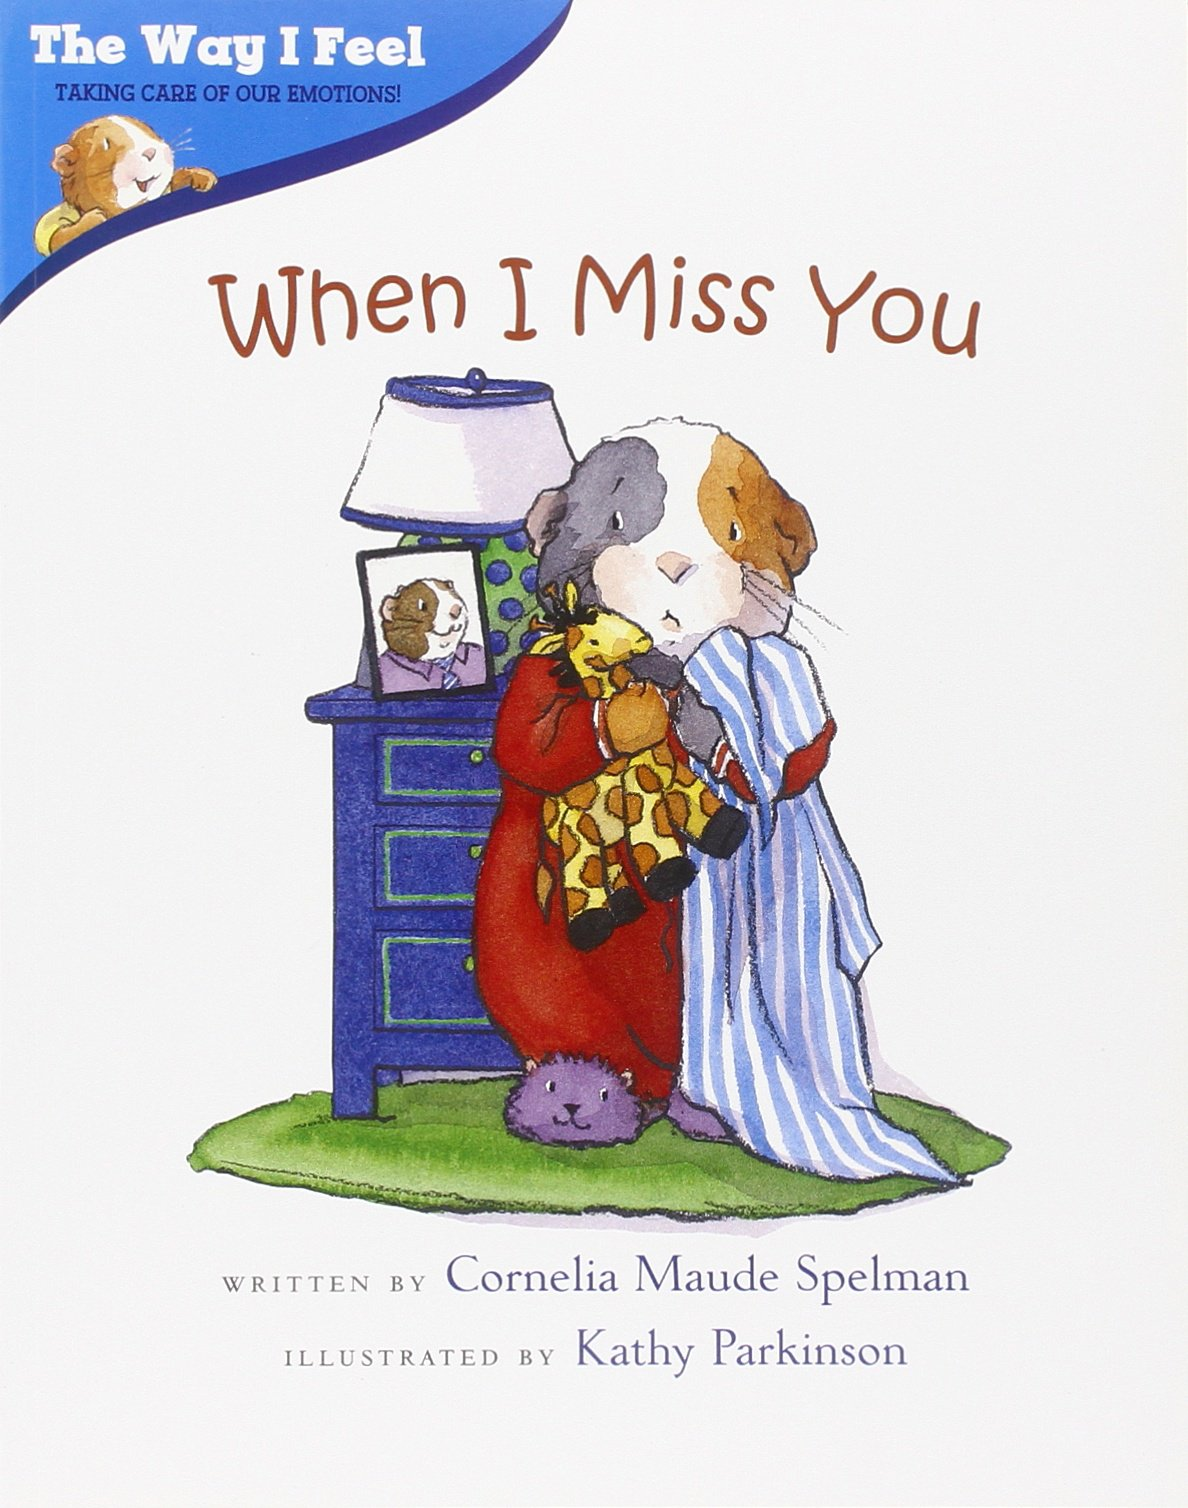 When I Miss You (Way I Feel Books): Amazon.co.uk: Cornelia Maude Spelman:  9780807589038: Books